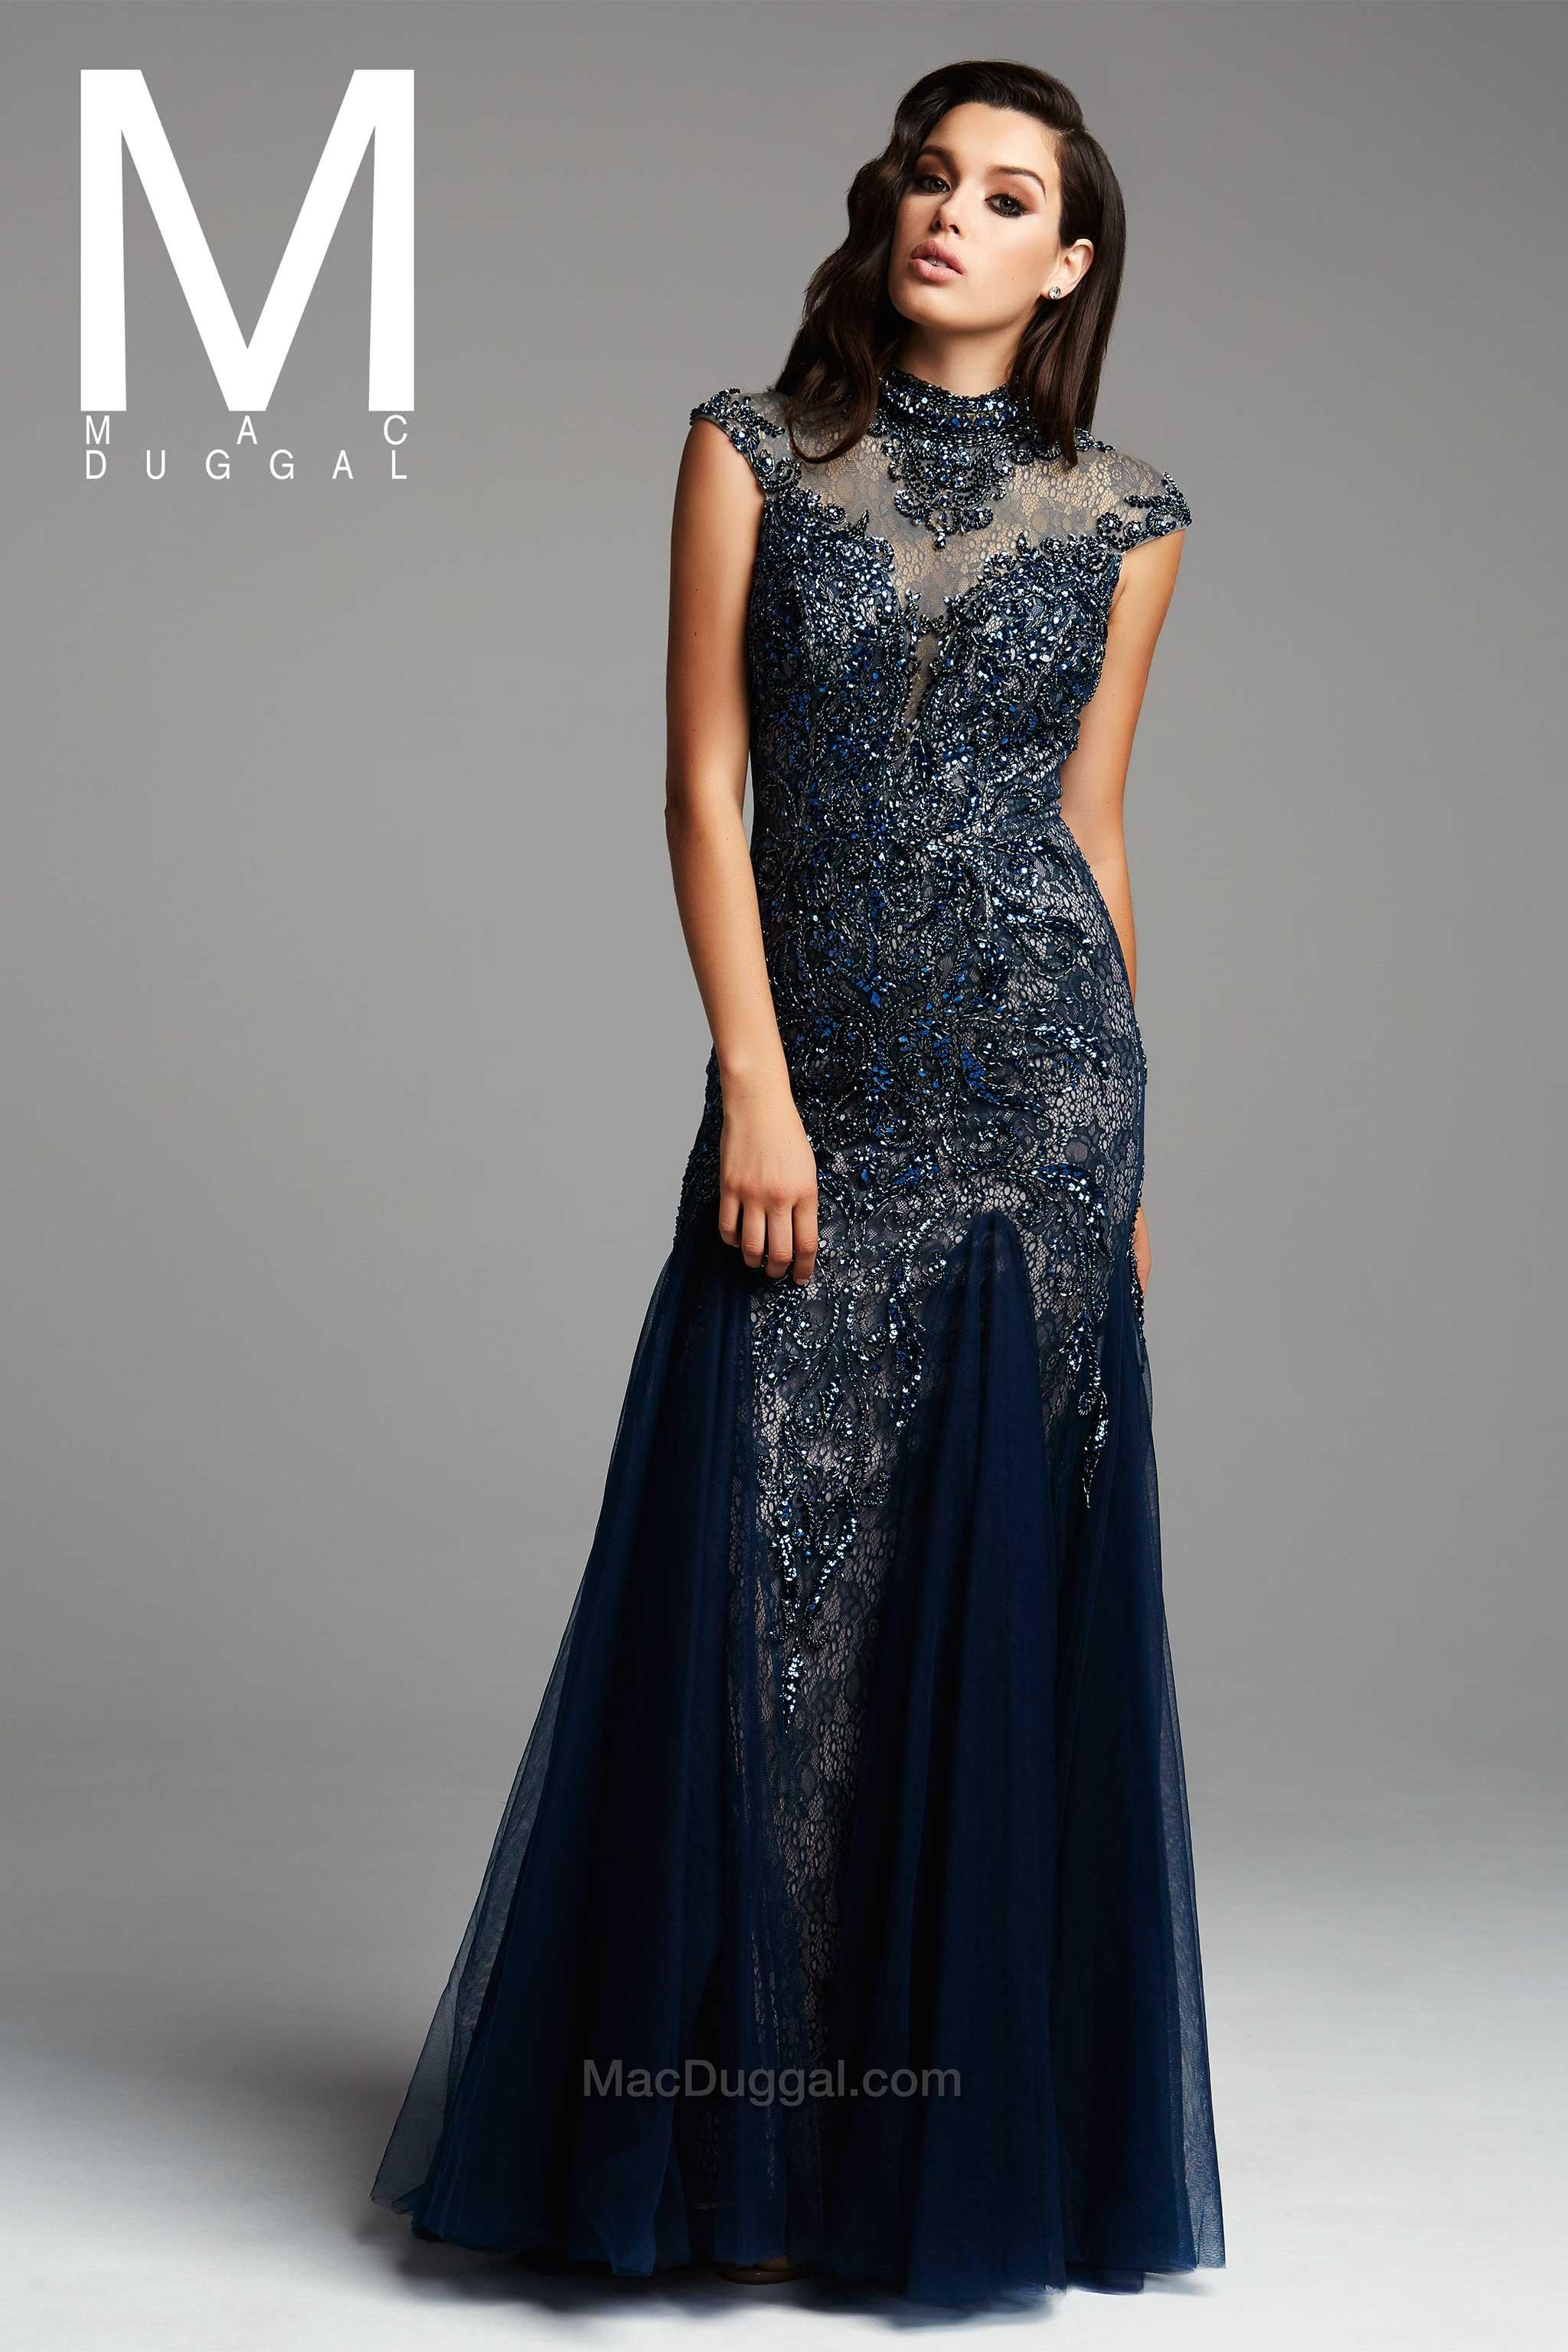 Mac Duggal Style 82391d Usa Prom Dress Httpbitly1rkmc7l